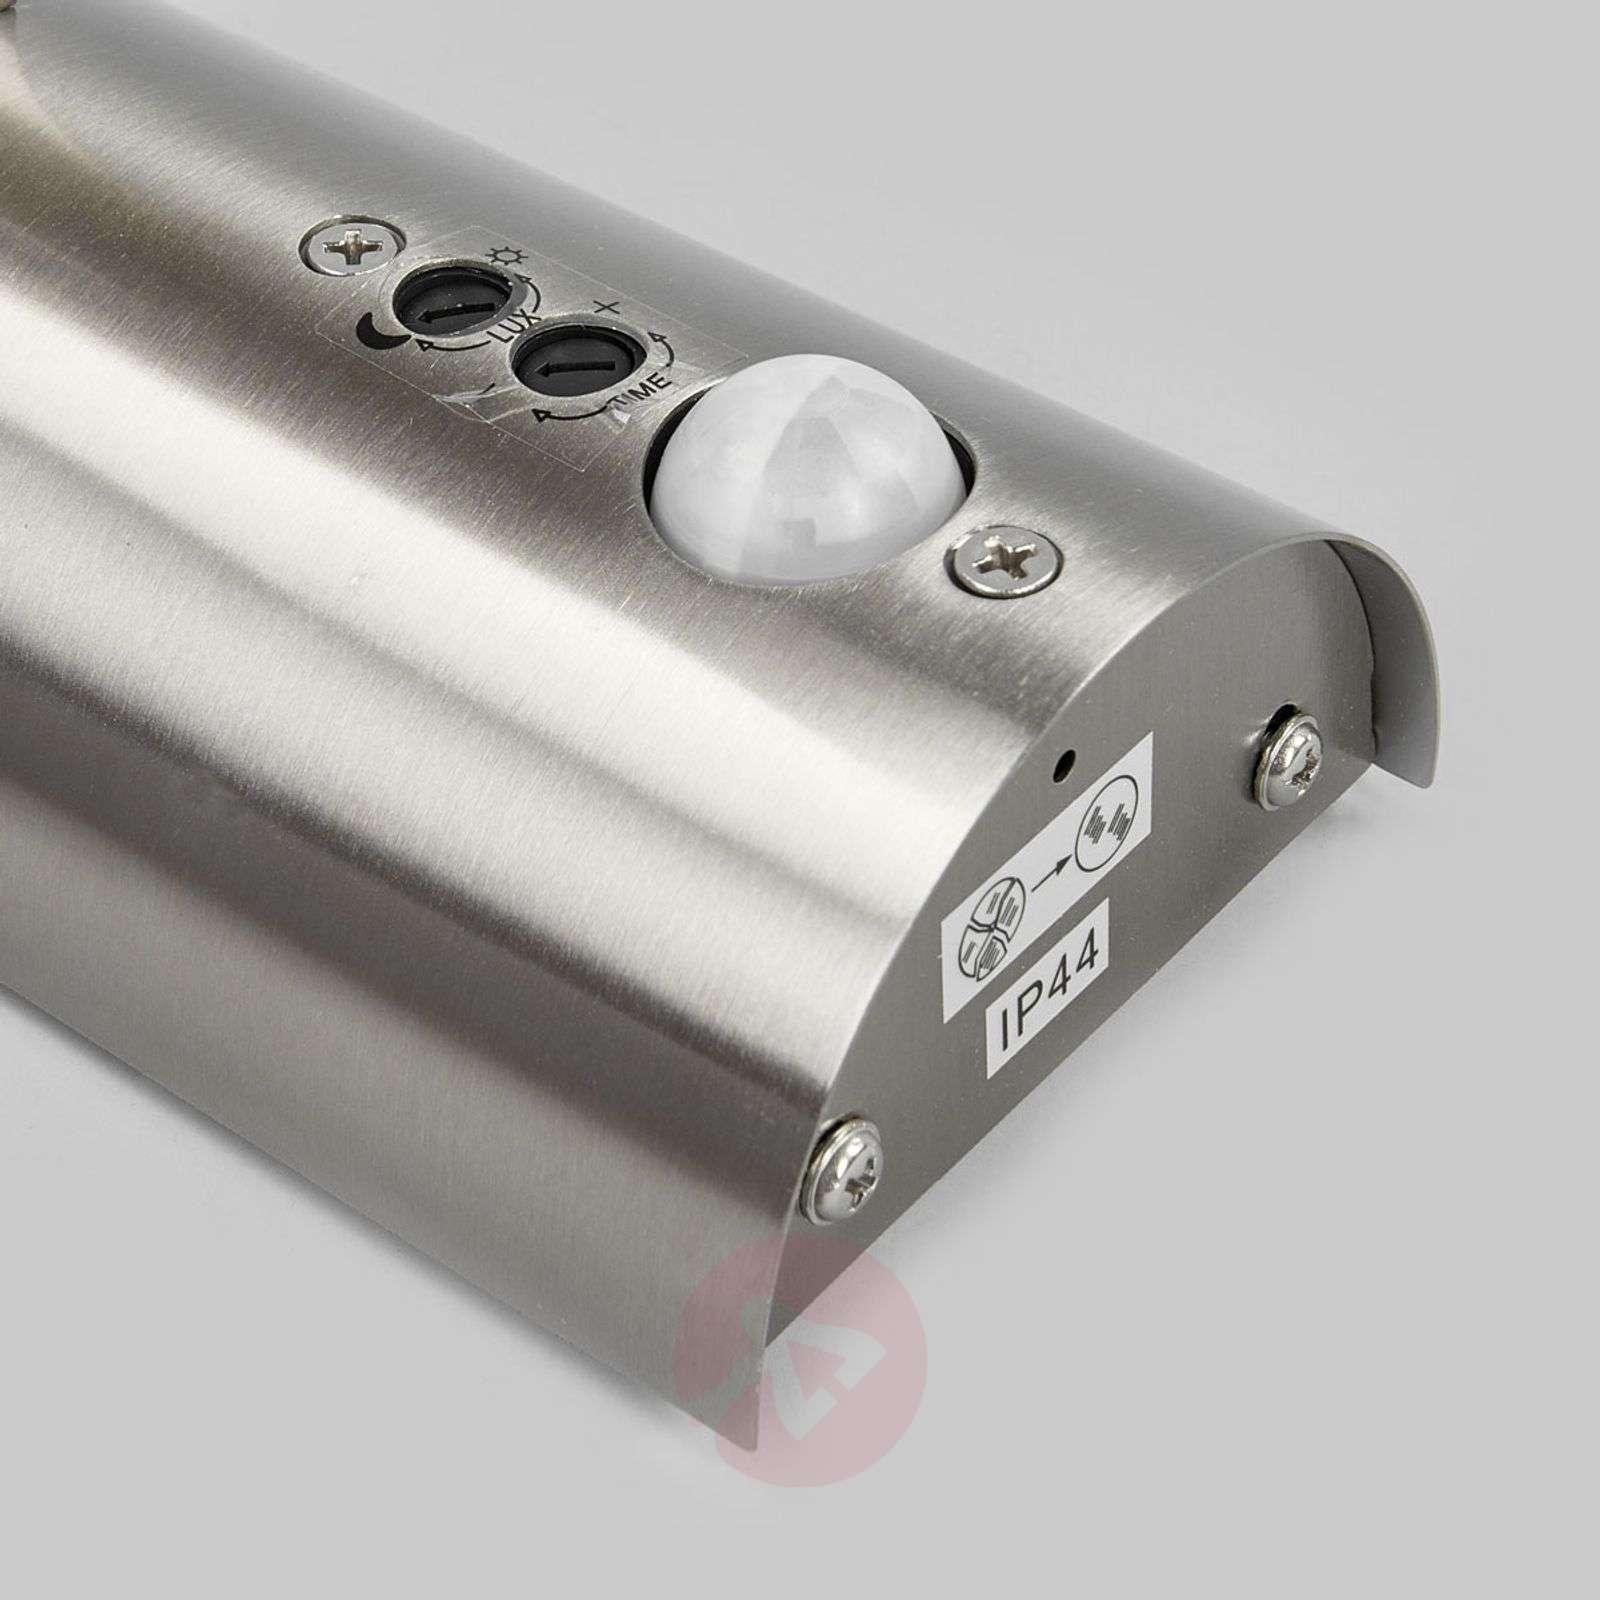 LED-ulkoseinävalaisin Trono Stick m. BWM-3000529-01